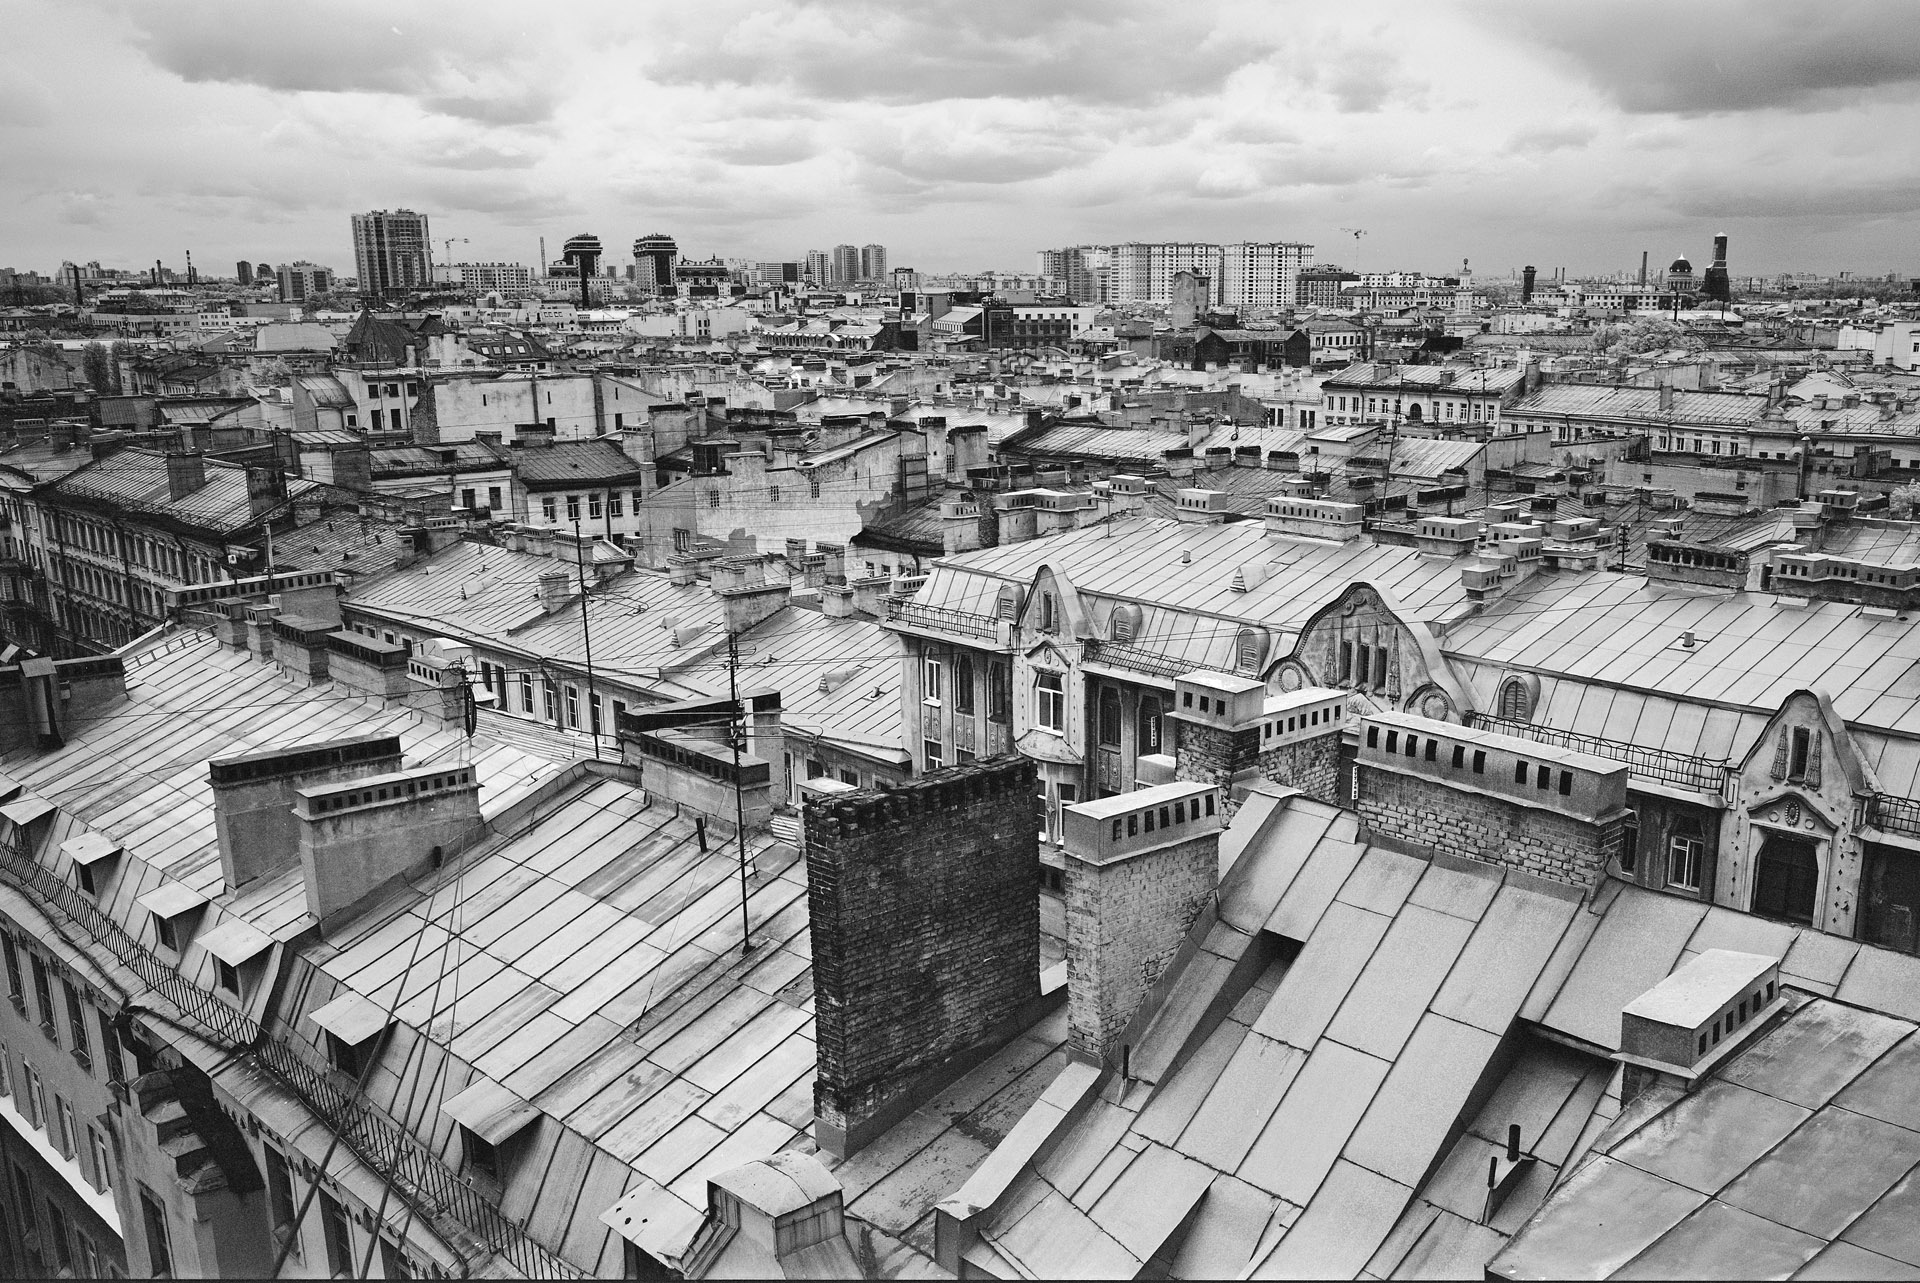 Roofs_003_RolleiIR_002